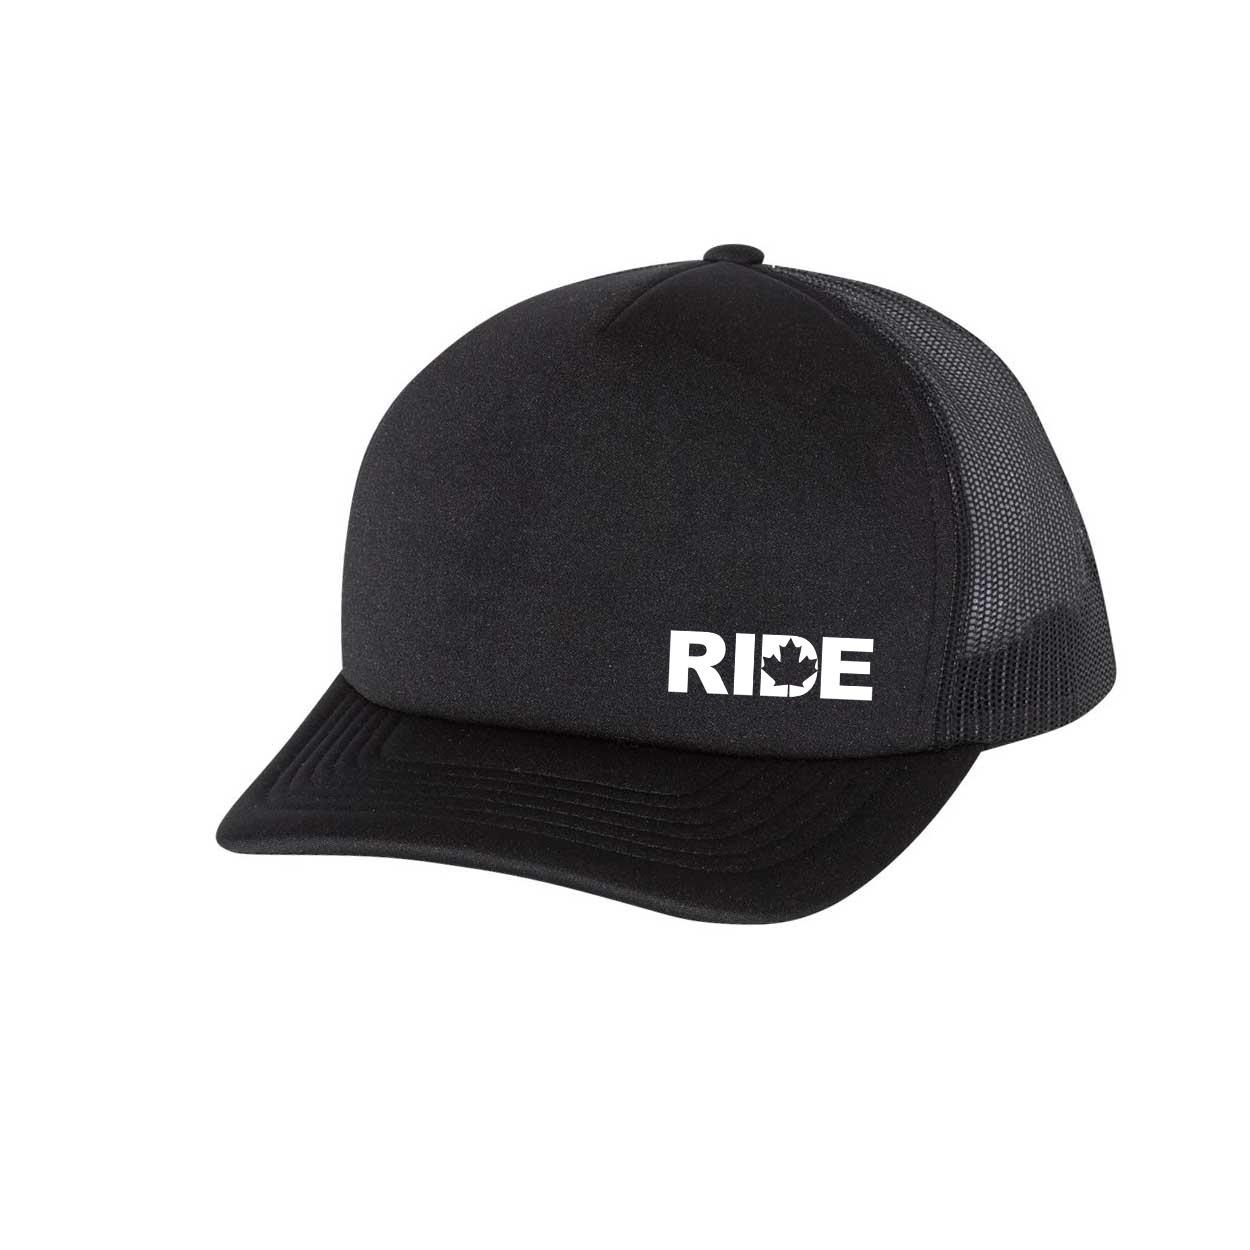 Ride Canada Night Out Premium Foam Trucker Snapback Hat Black (White Logo)